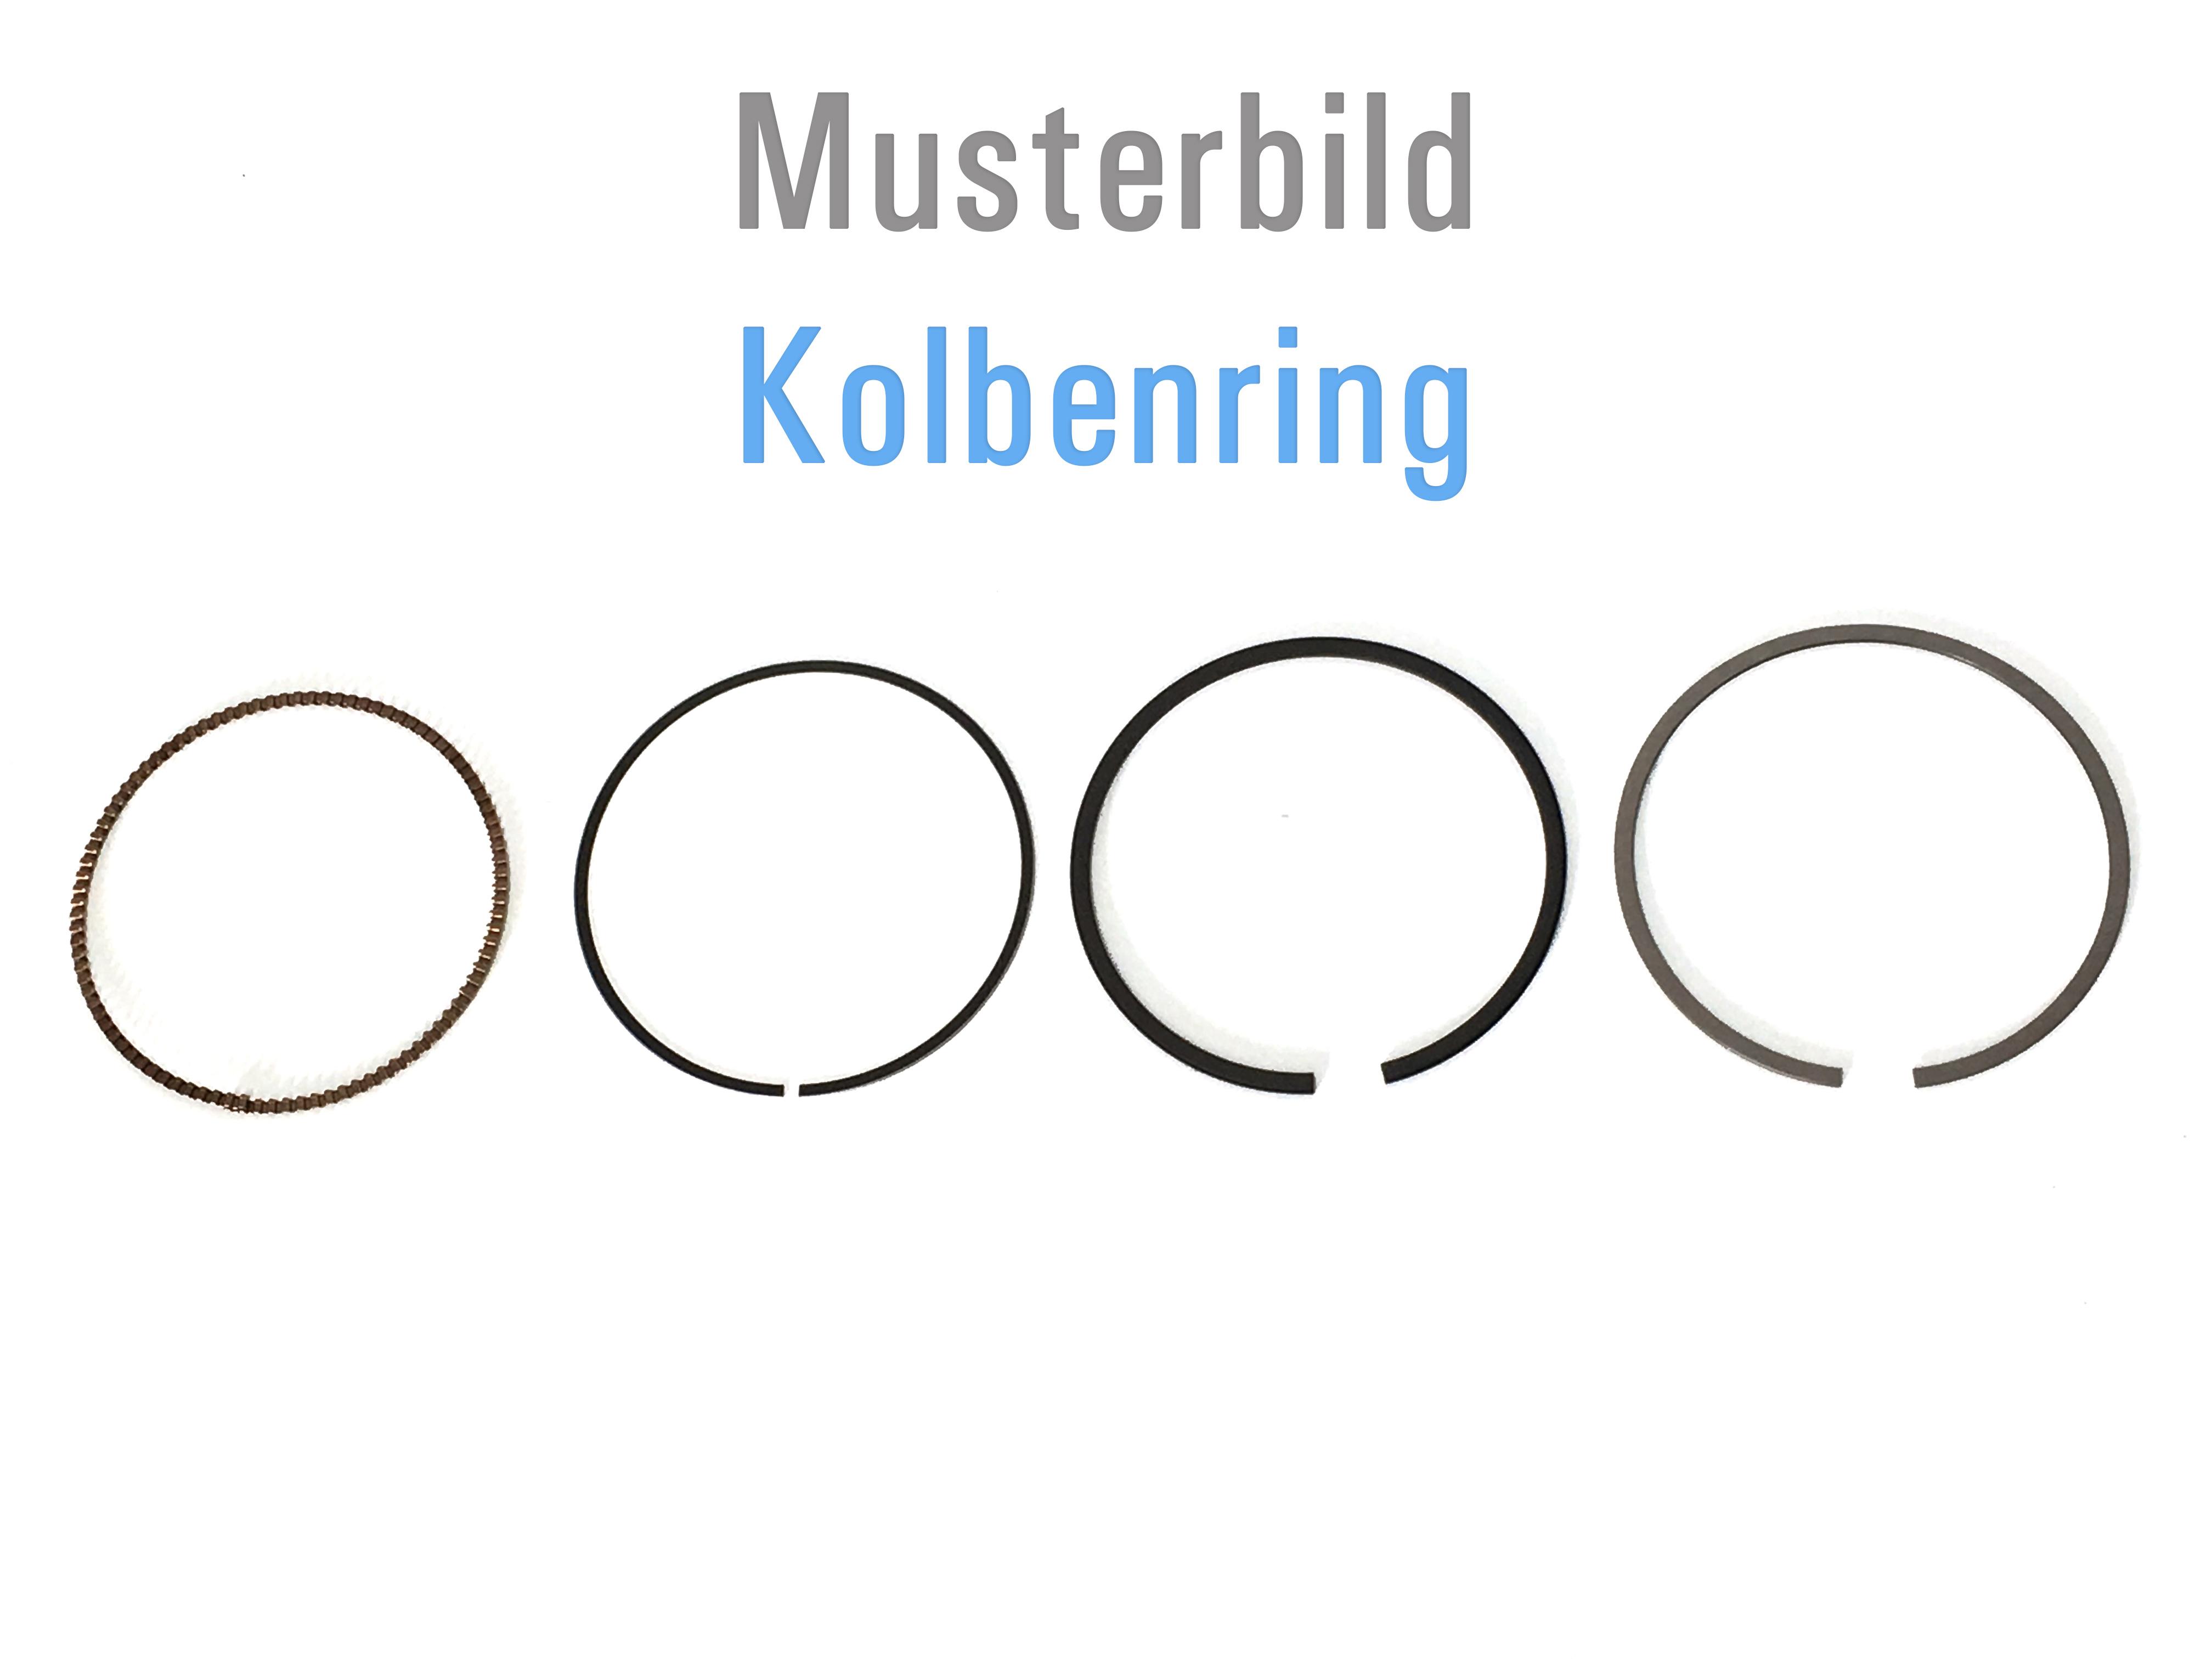 1x Kolbenring Porsche 911 997 3,8 Carrera S 97.01 99710305305 NEU